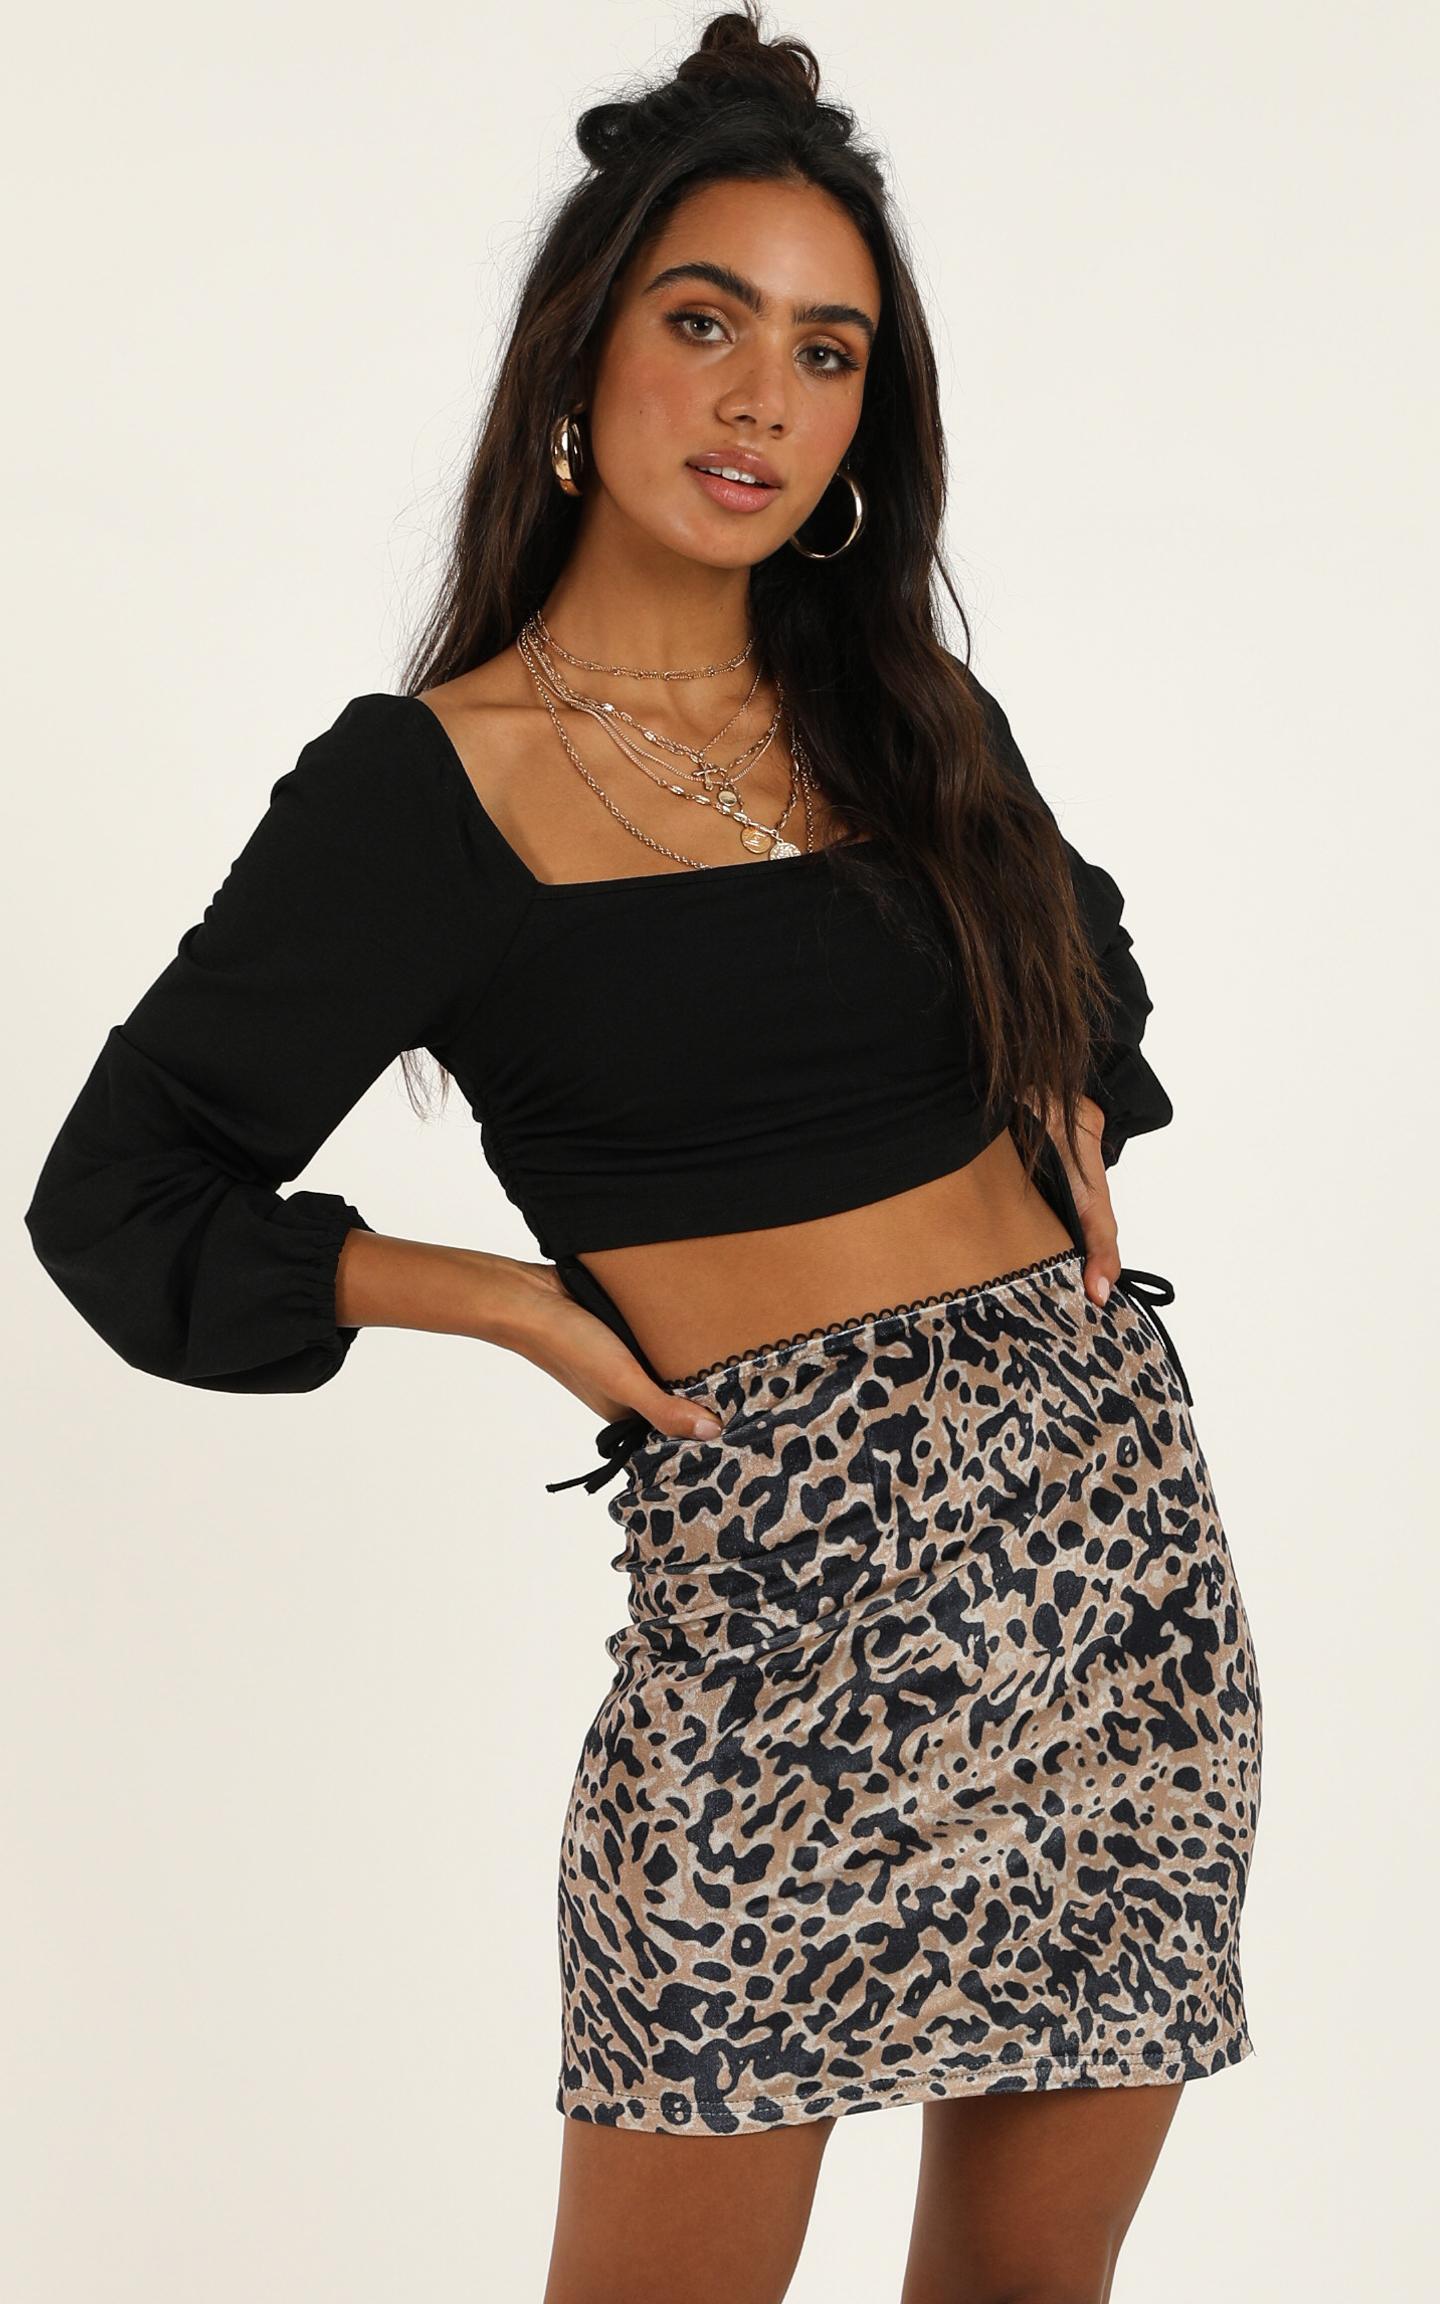 Disco Yes skirt in leopard print velvet - 6 (XS), Brown, hi-res image number null